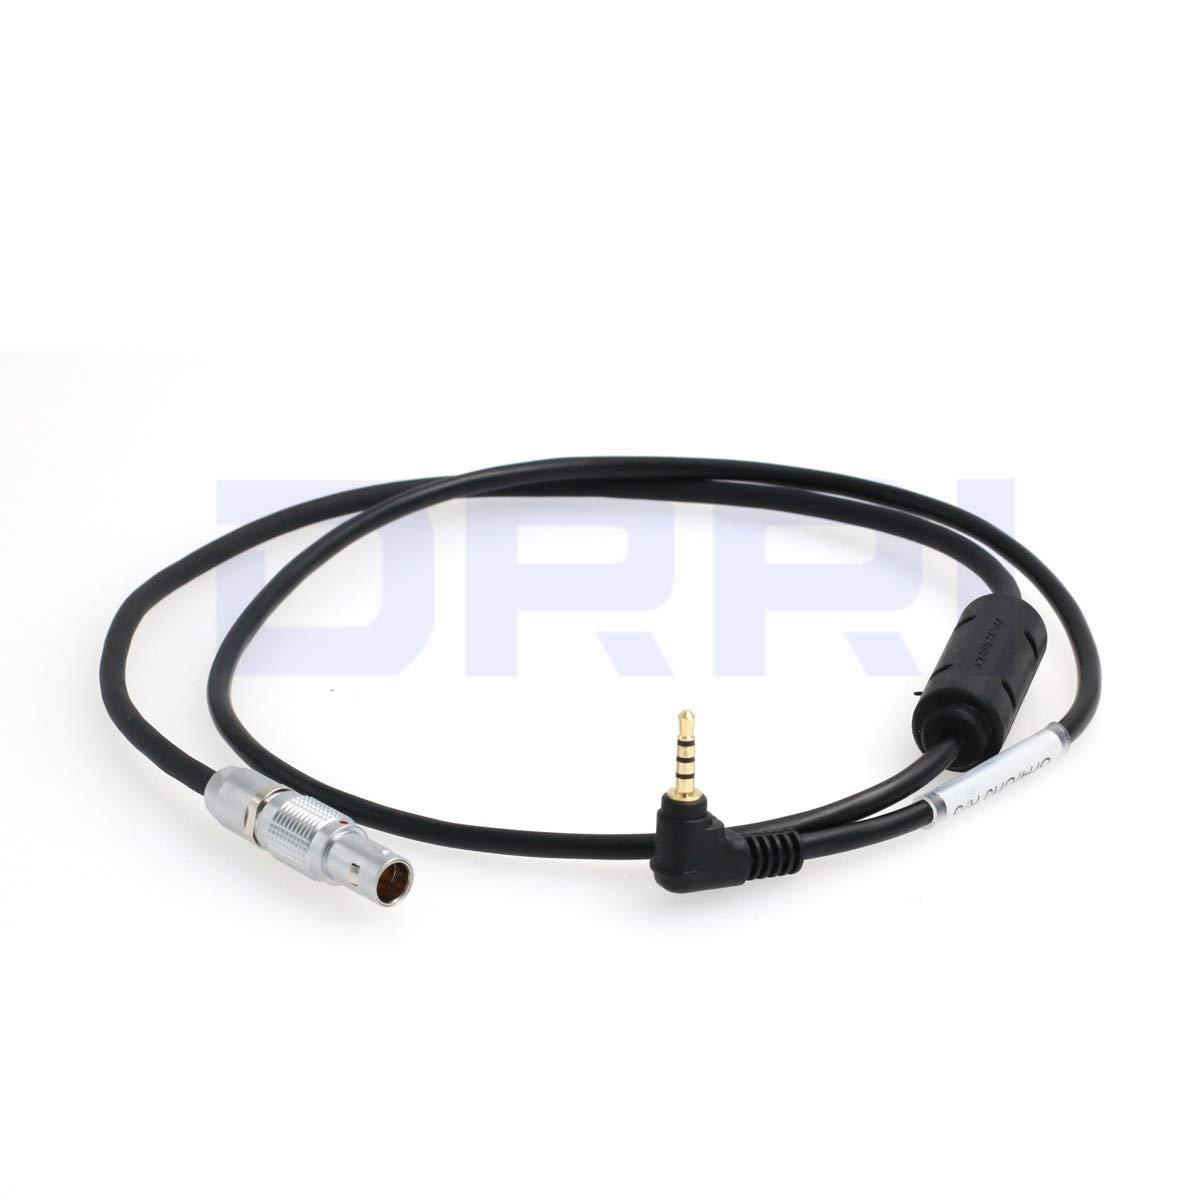 DRRI Tilta Nucleus-M Run//Stop Cable for Sony FS5//FS7,Panasonic Eva Cameras